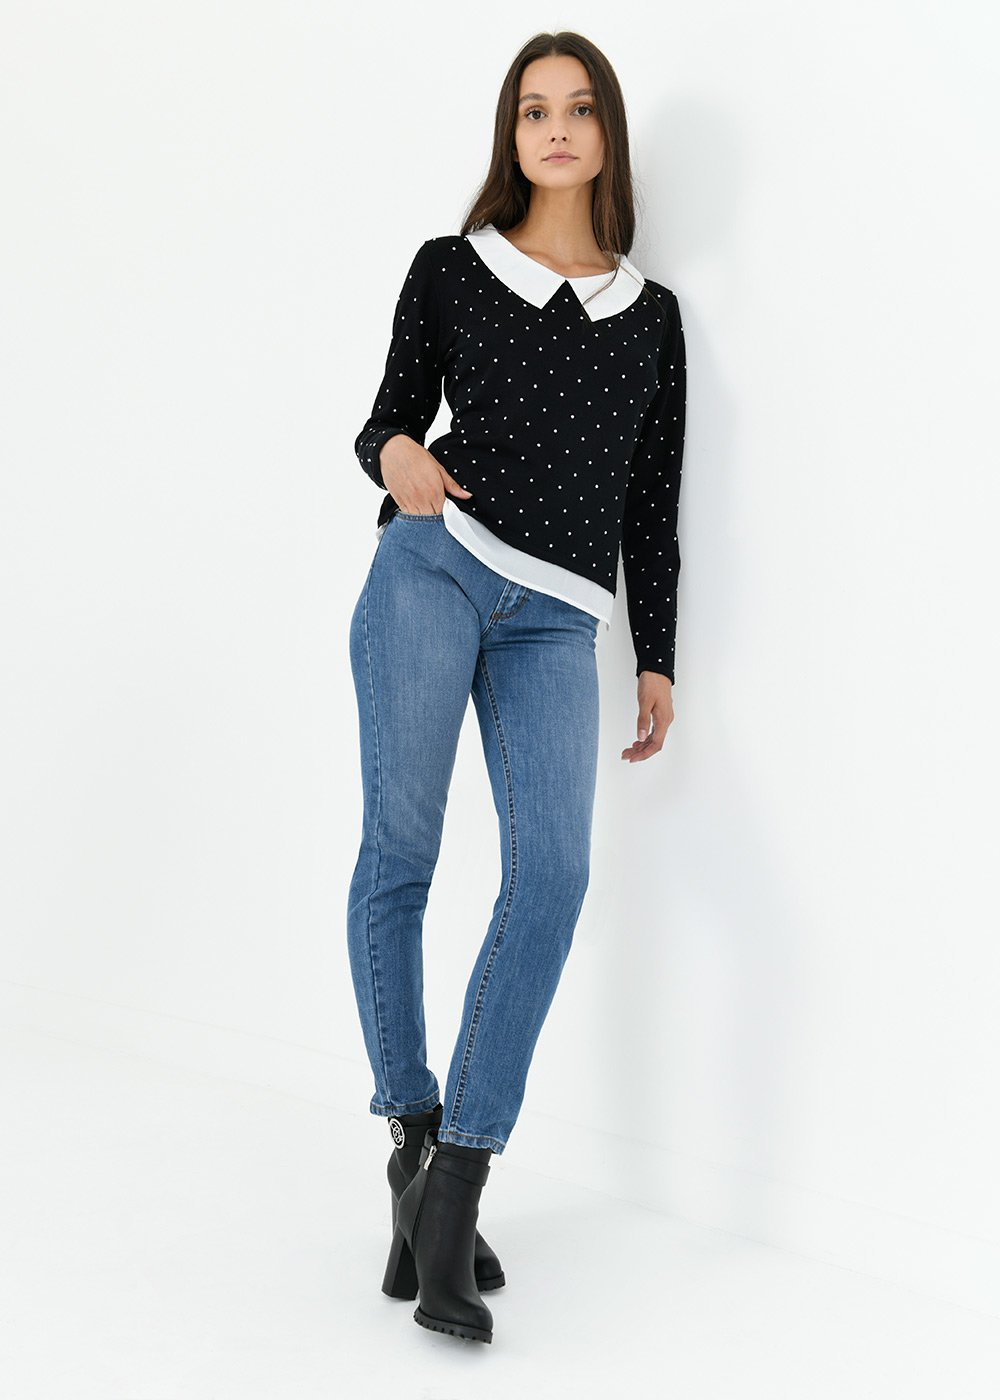 Denim Kate modello skinny - Denim - Donna